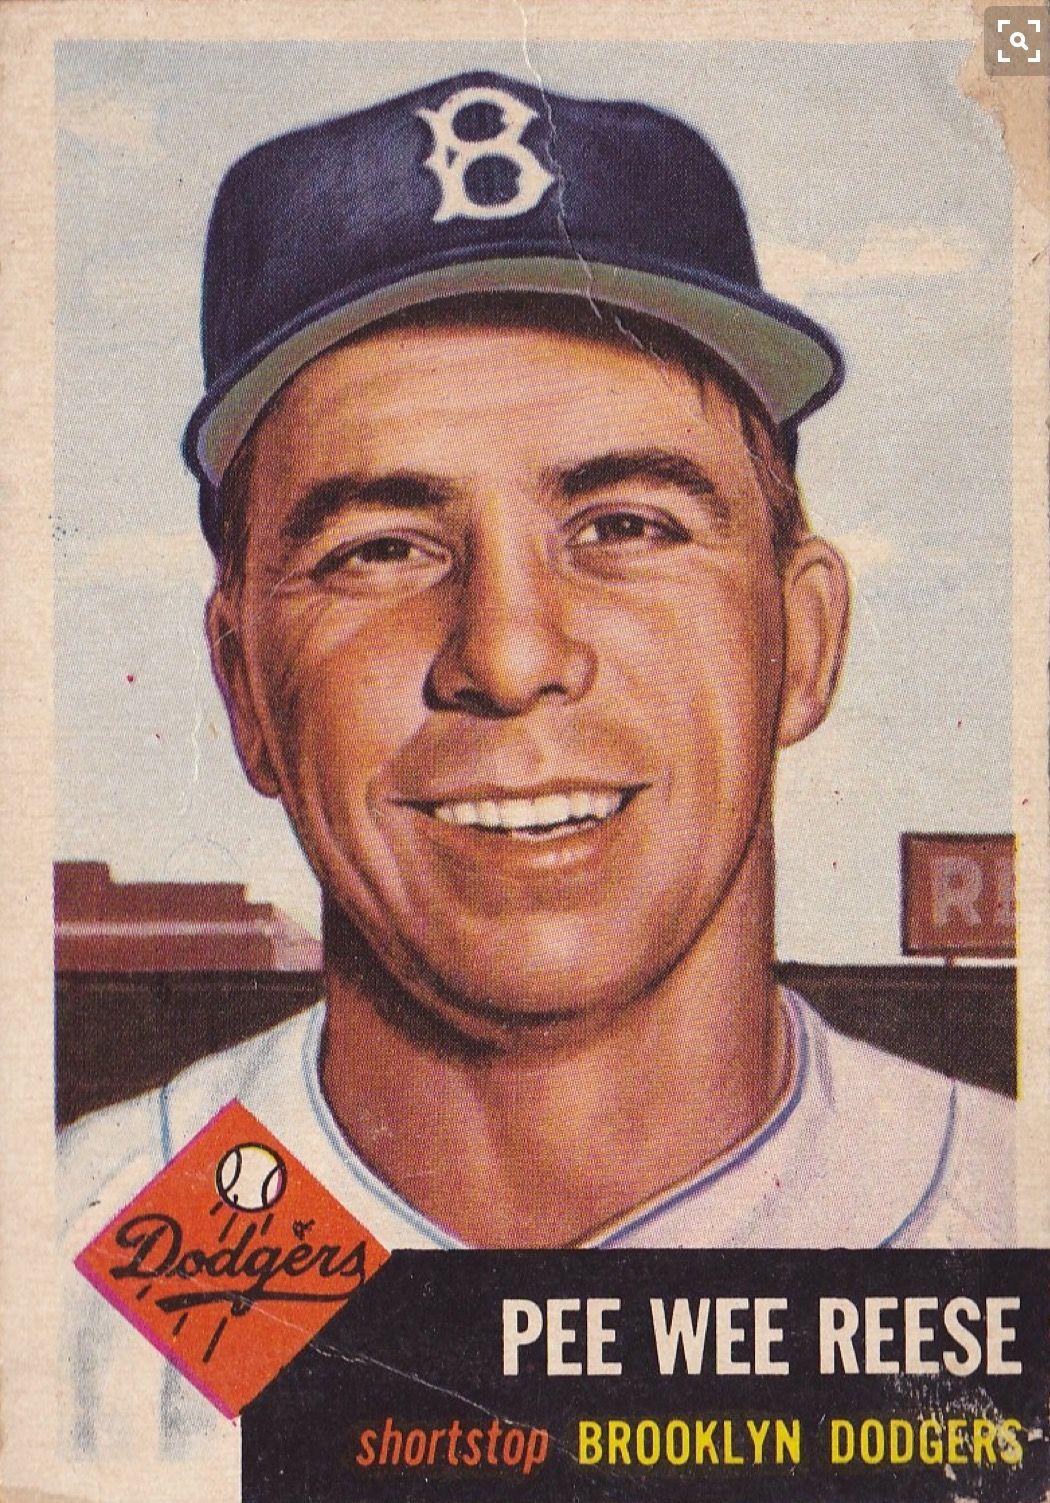 1953 topps pee wee reese old baseball cards baseball